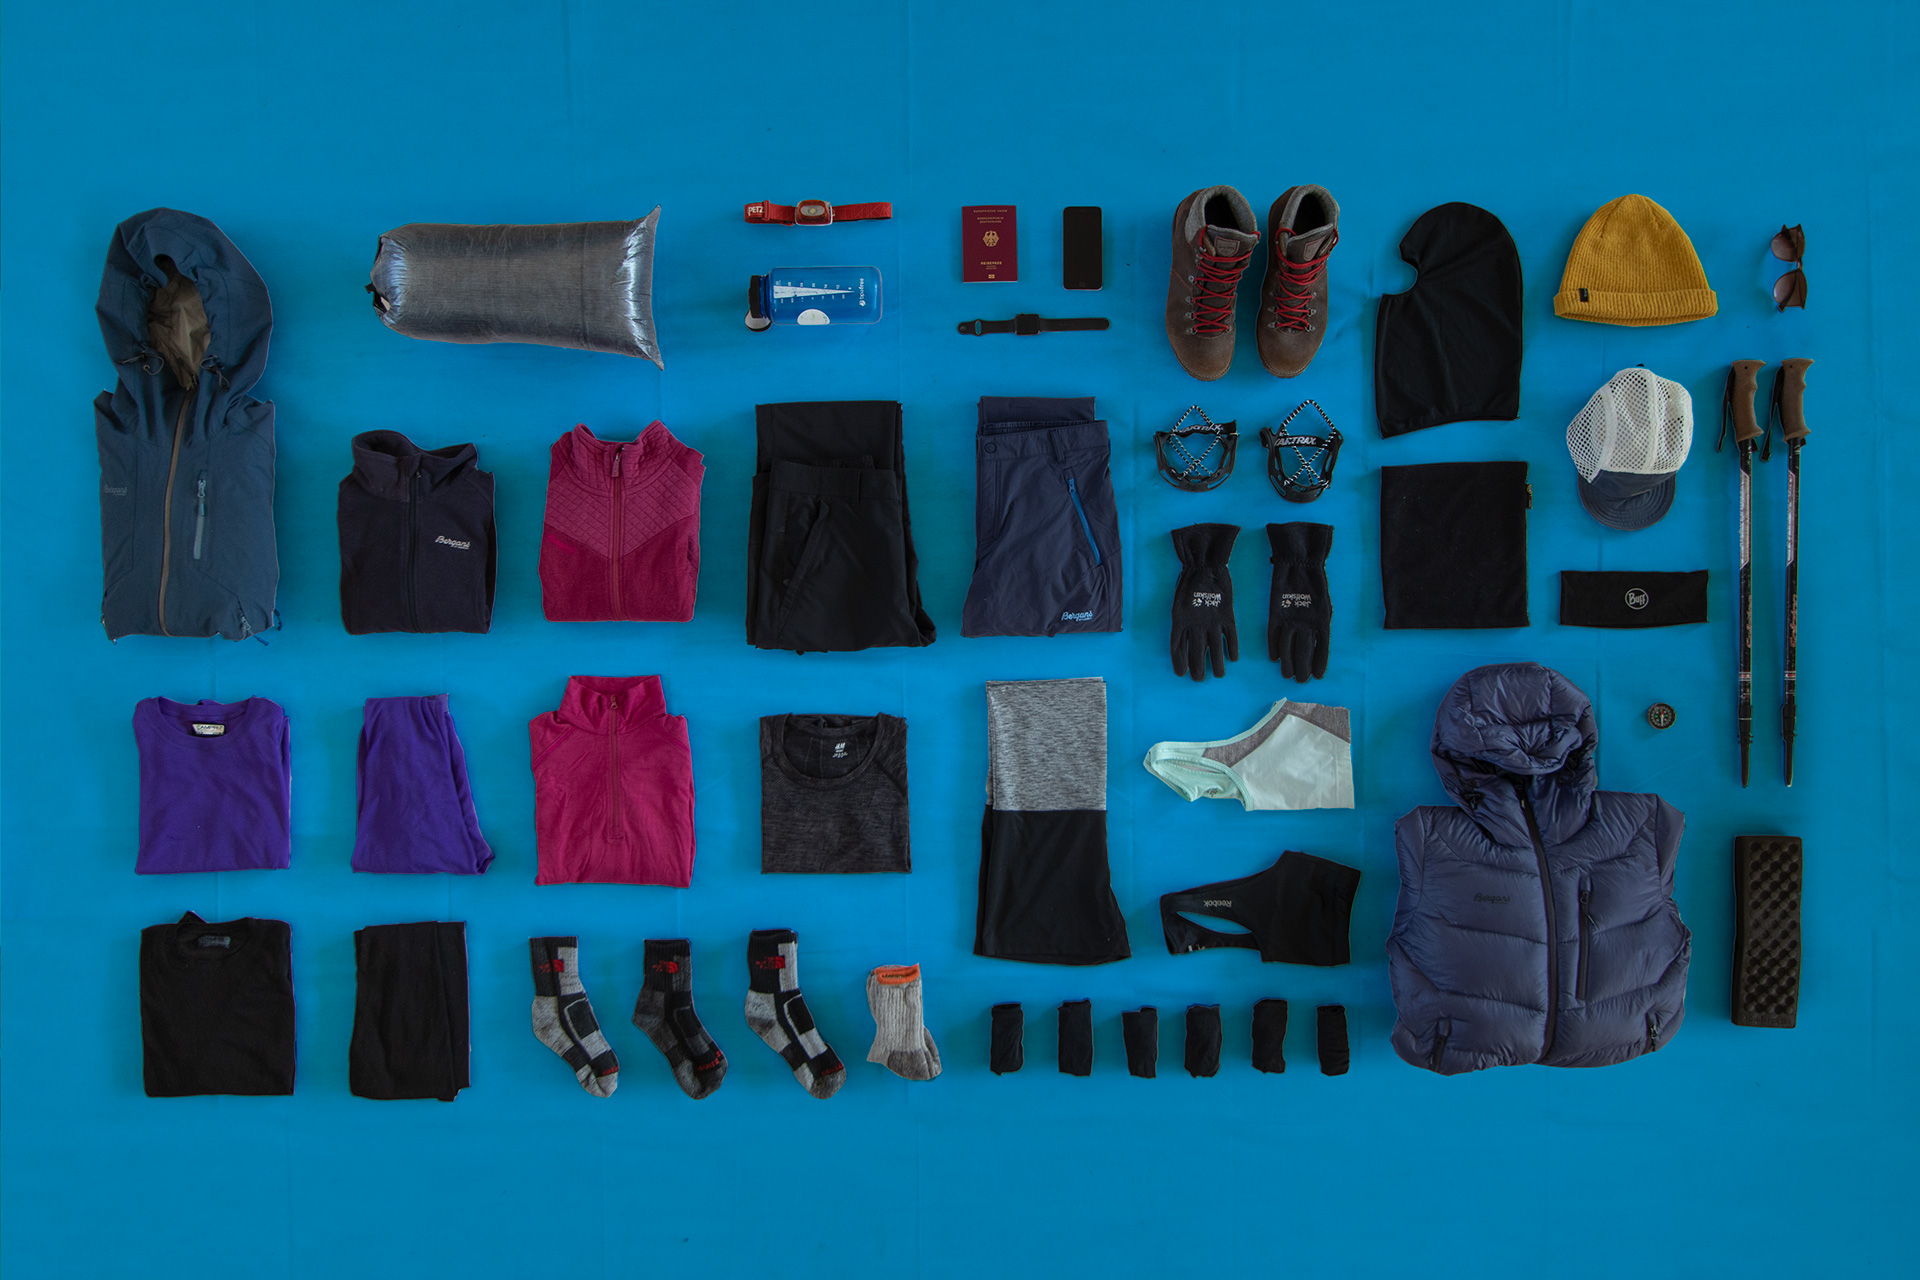 Annapurna Circuit & Annapurna Base Camp Trek Packing List | | Women | Outside Material